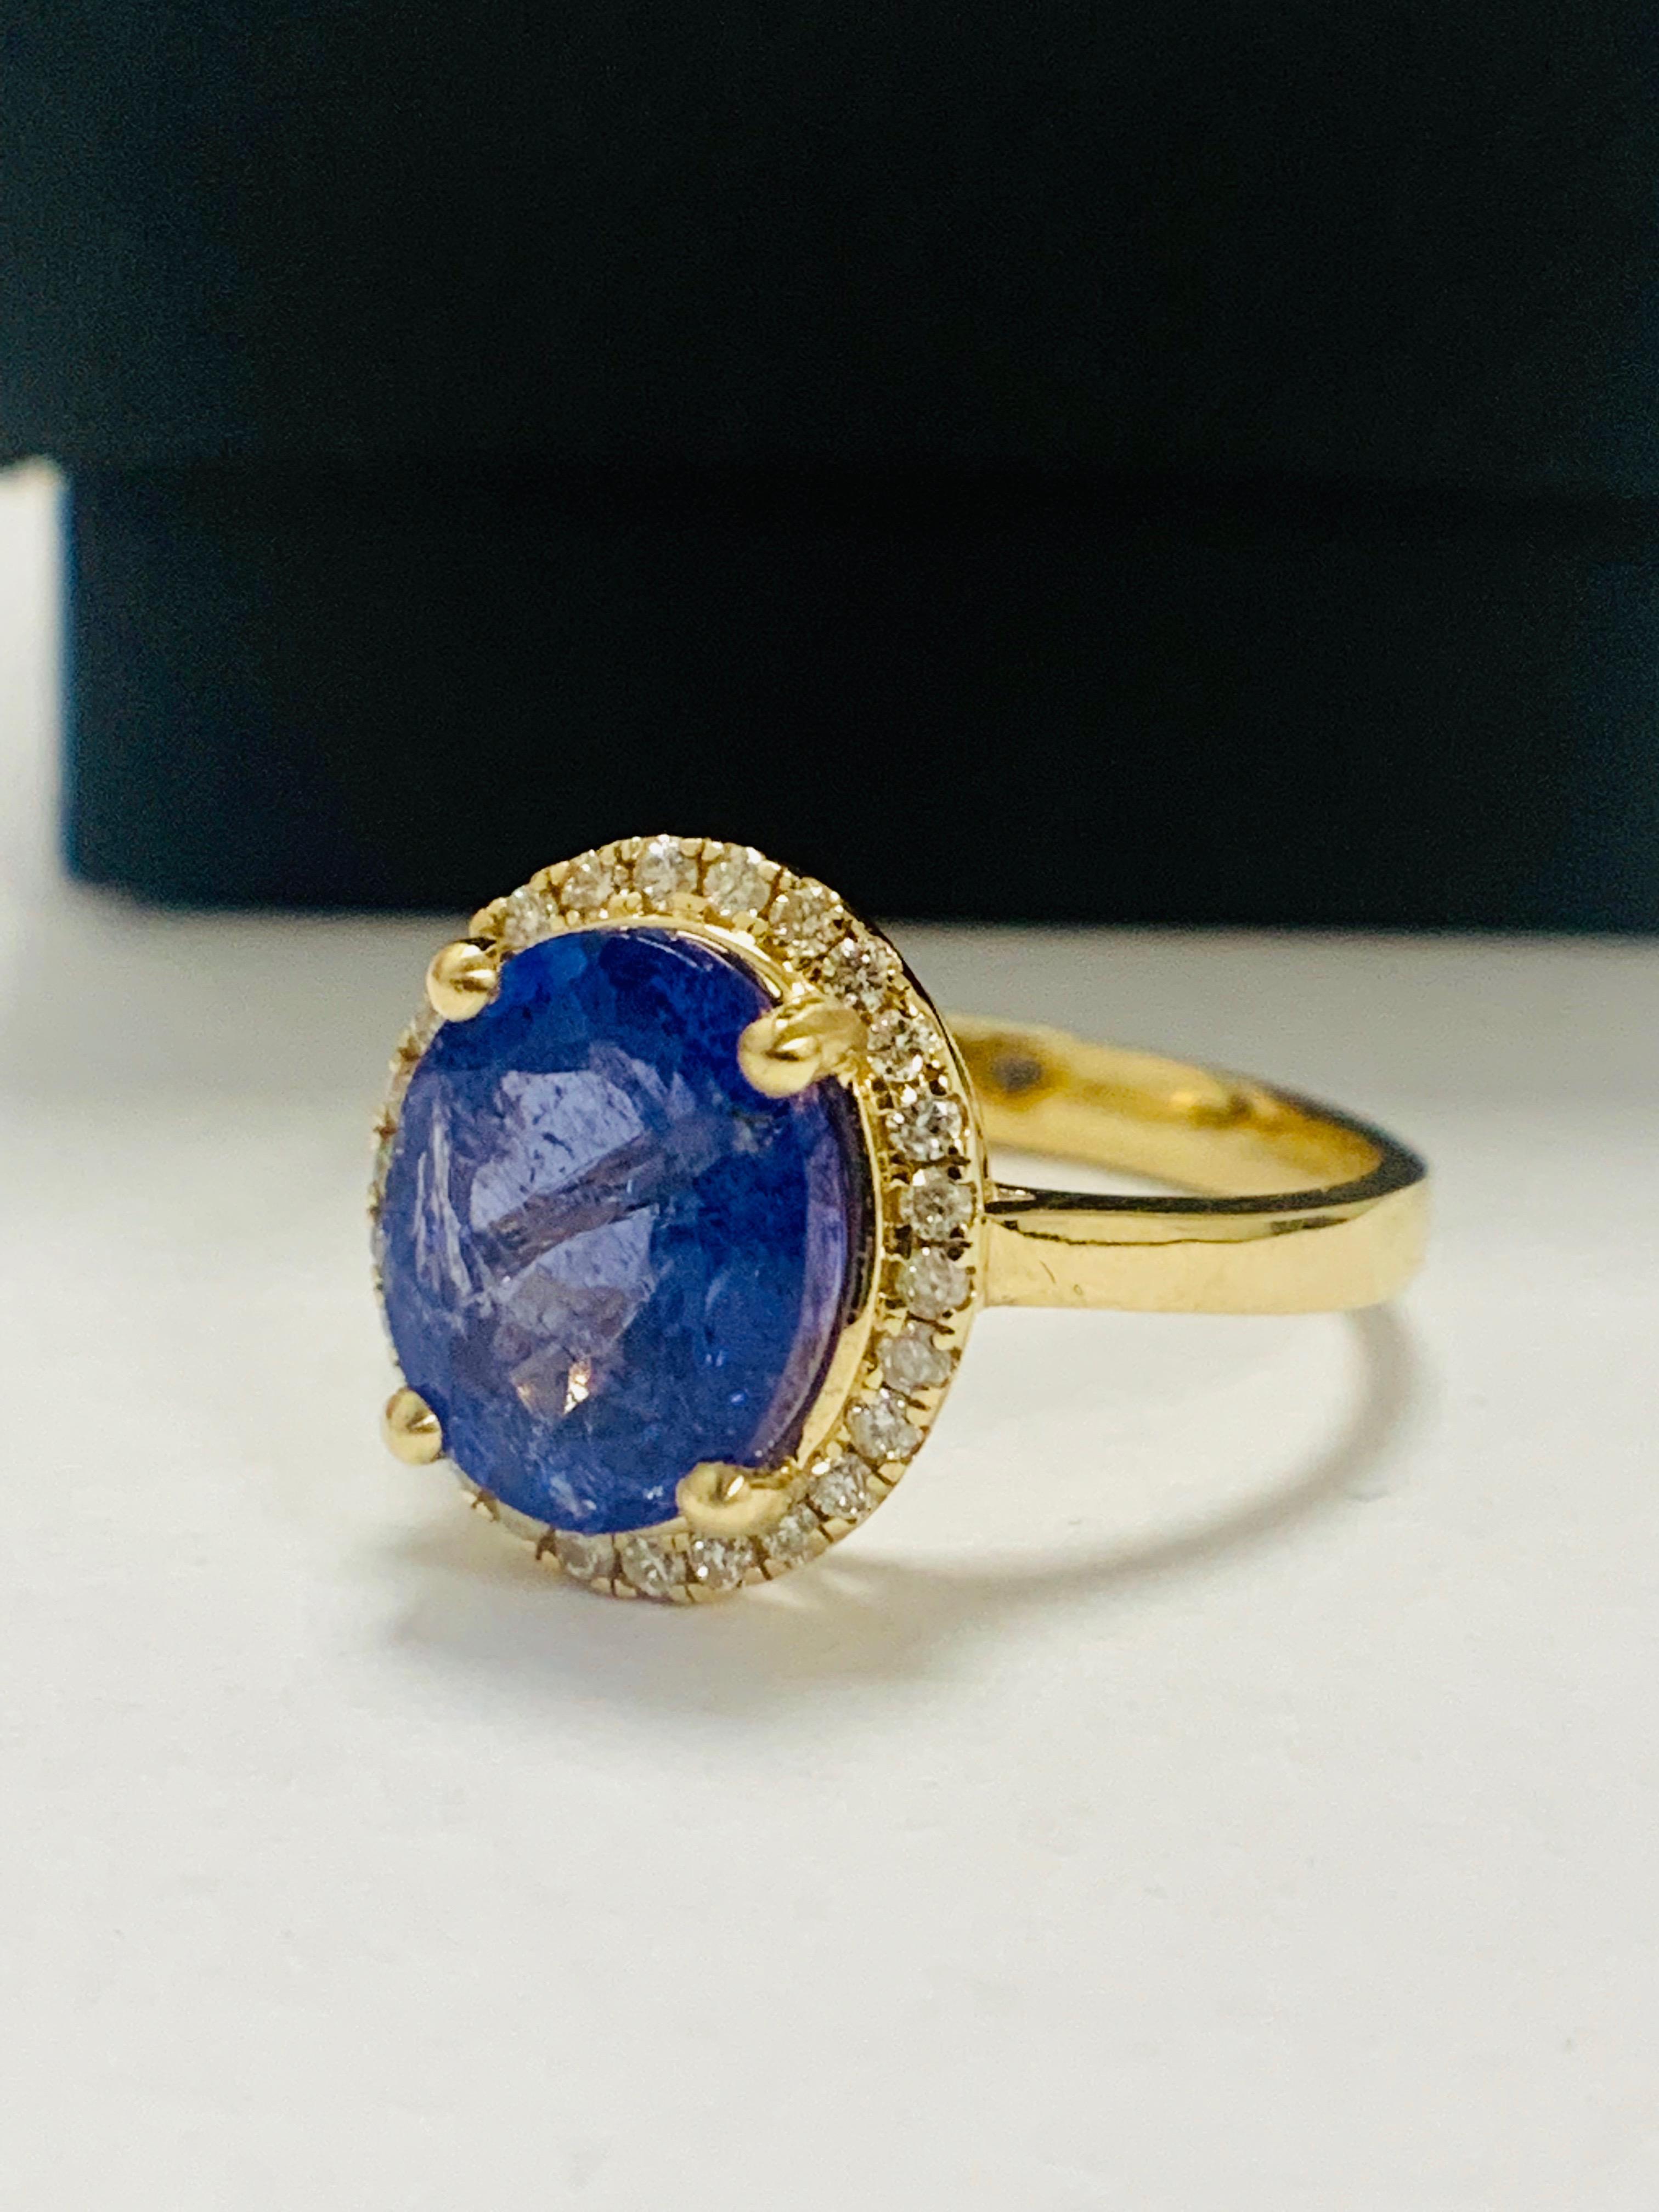 14ct Yellow Gold Tanzanite and Diamond ring - Image 2 of 13